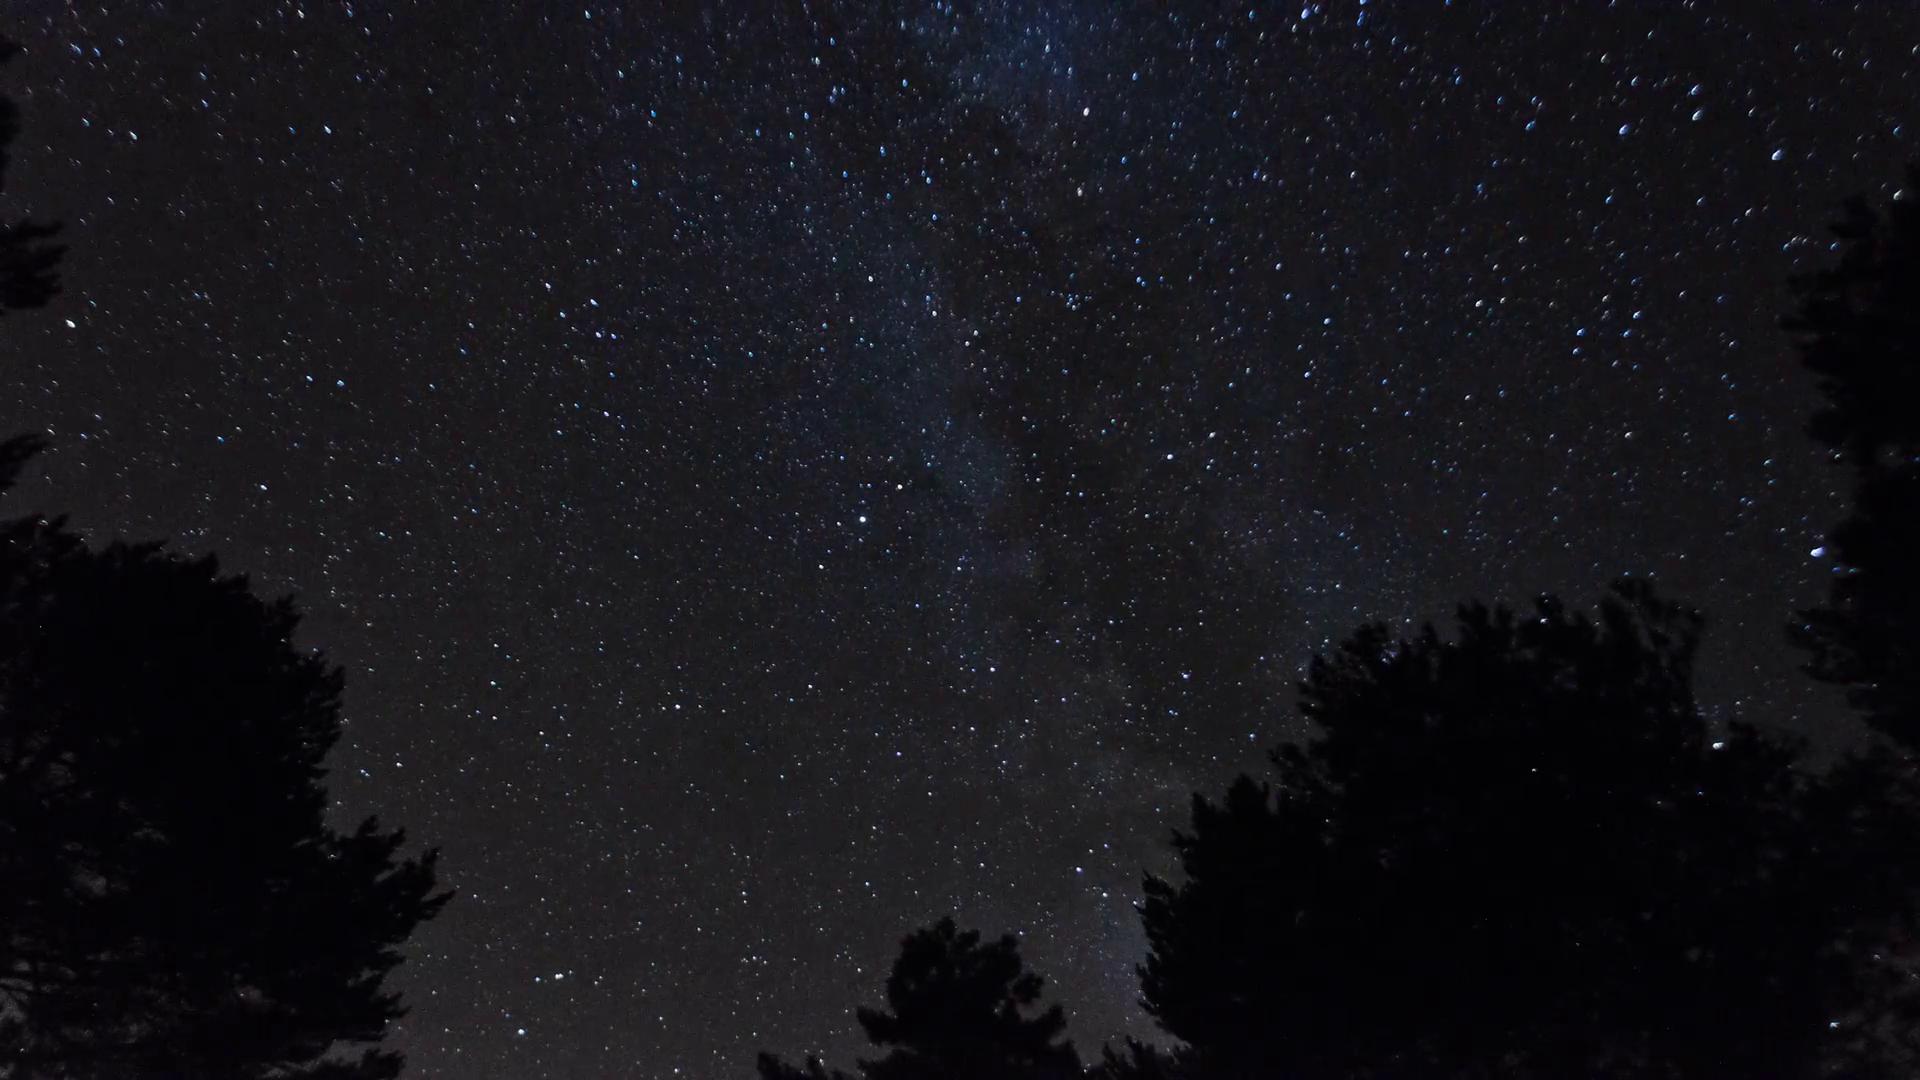 night-sky-stars-timelpase_ekgh5feve__F0000.png